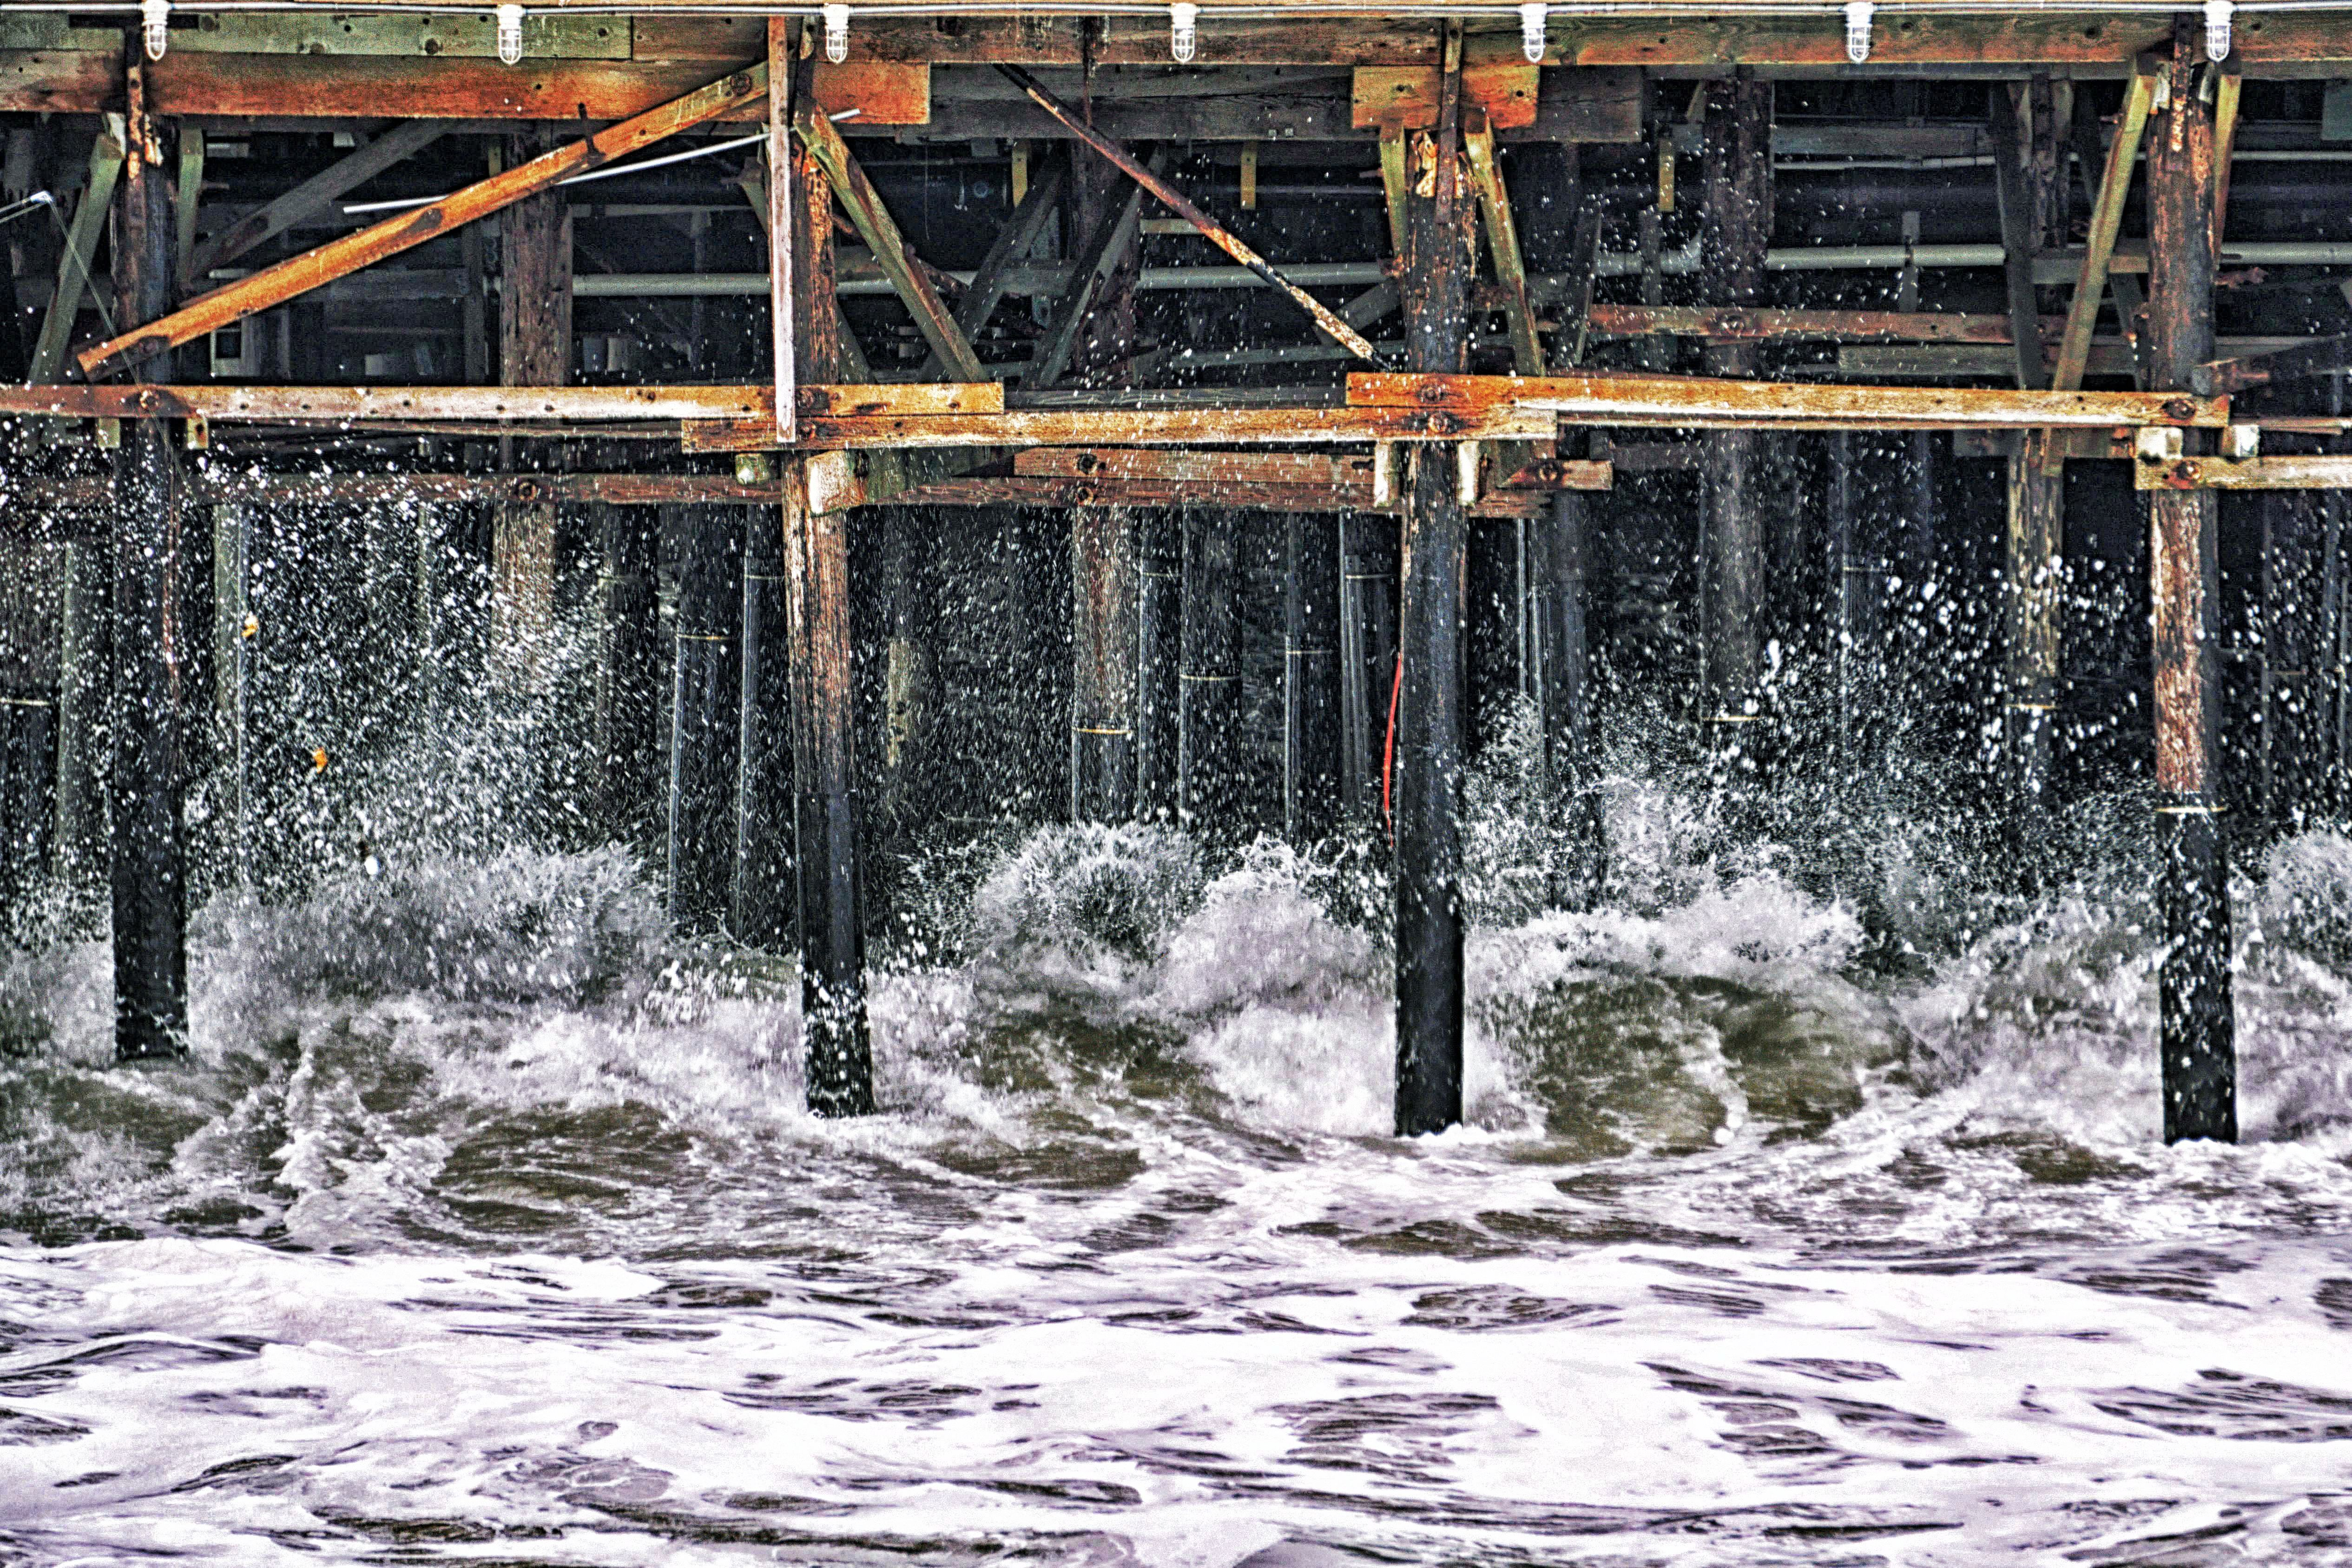 Pier, Santa Monica, CA